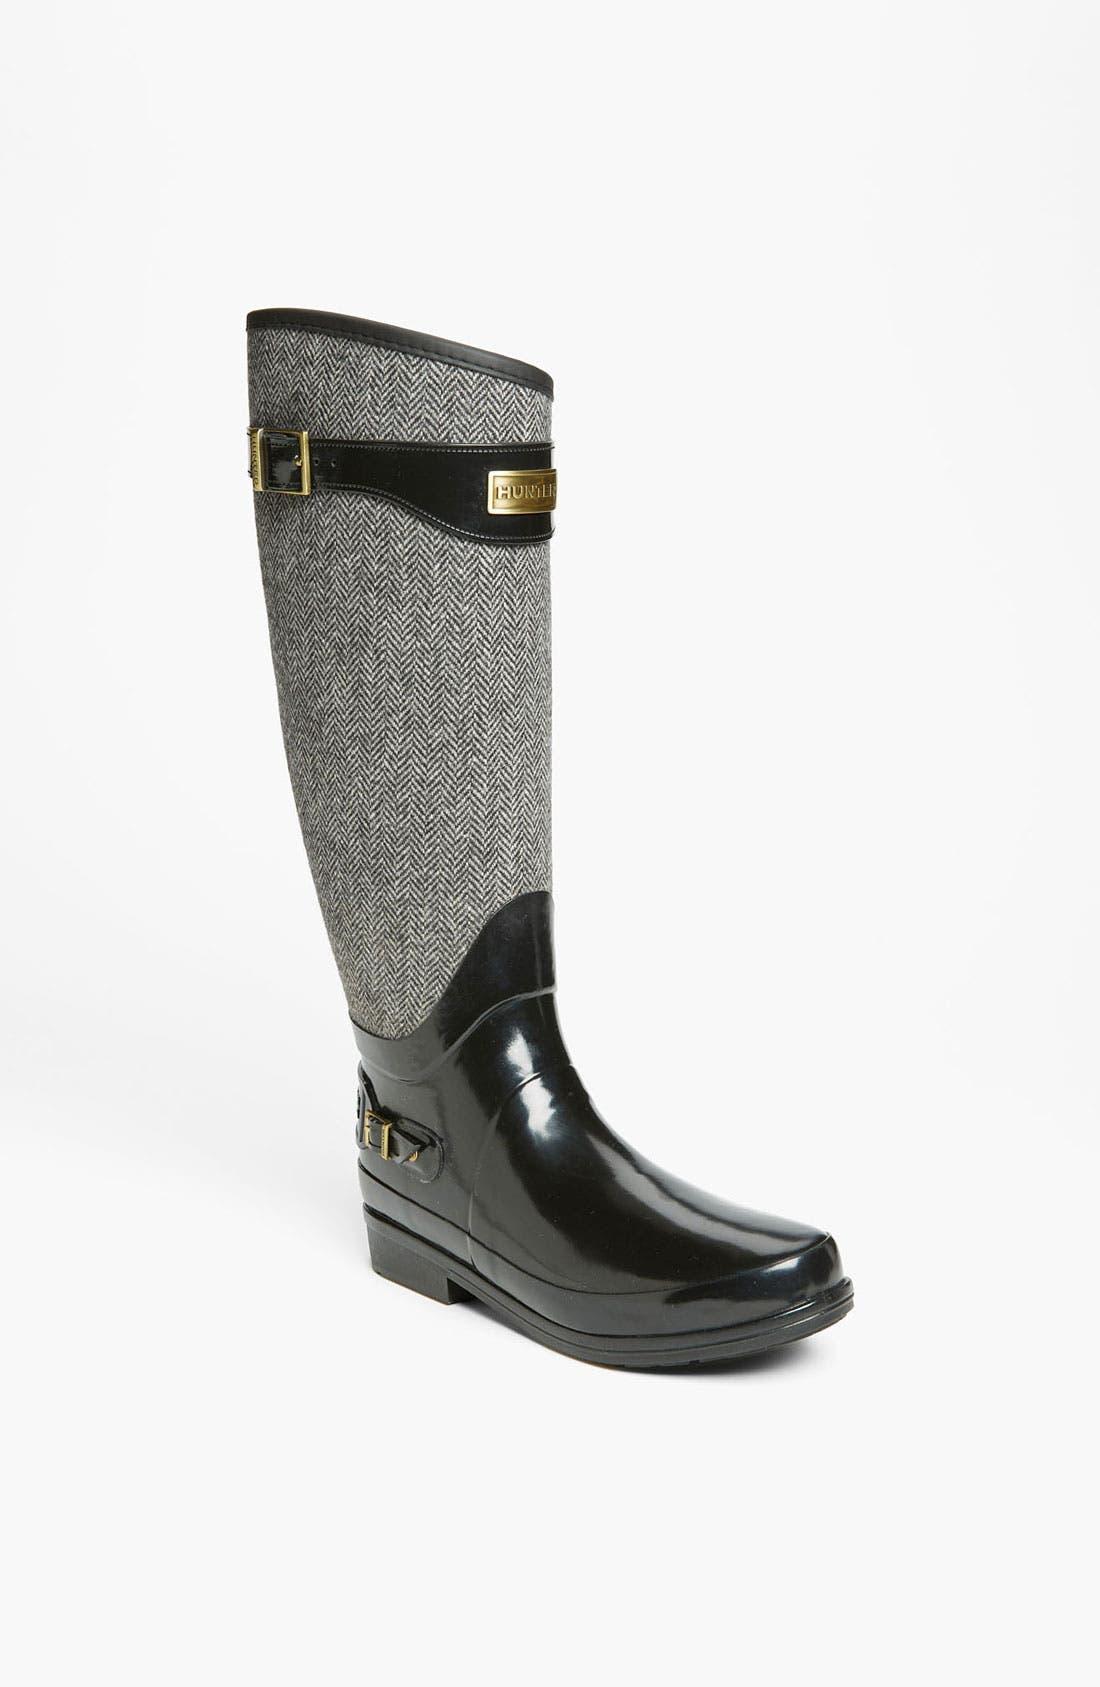 Main Image - Hunter 'Regent Apsley' Rain Boot (Women)